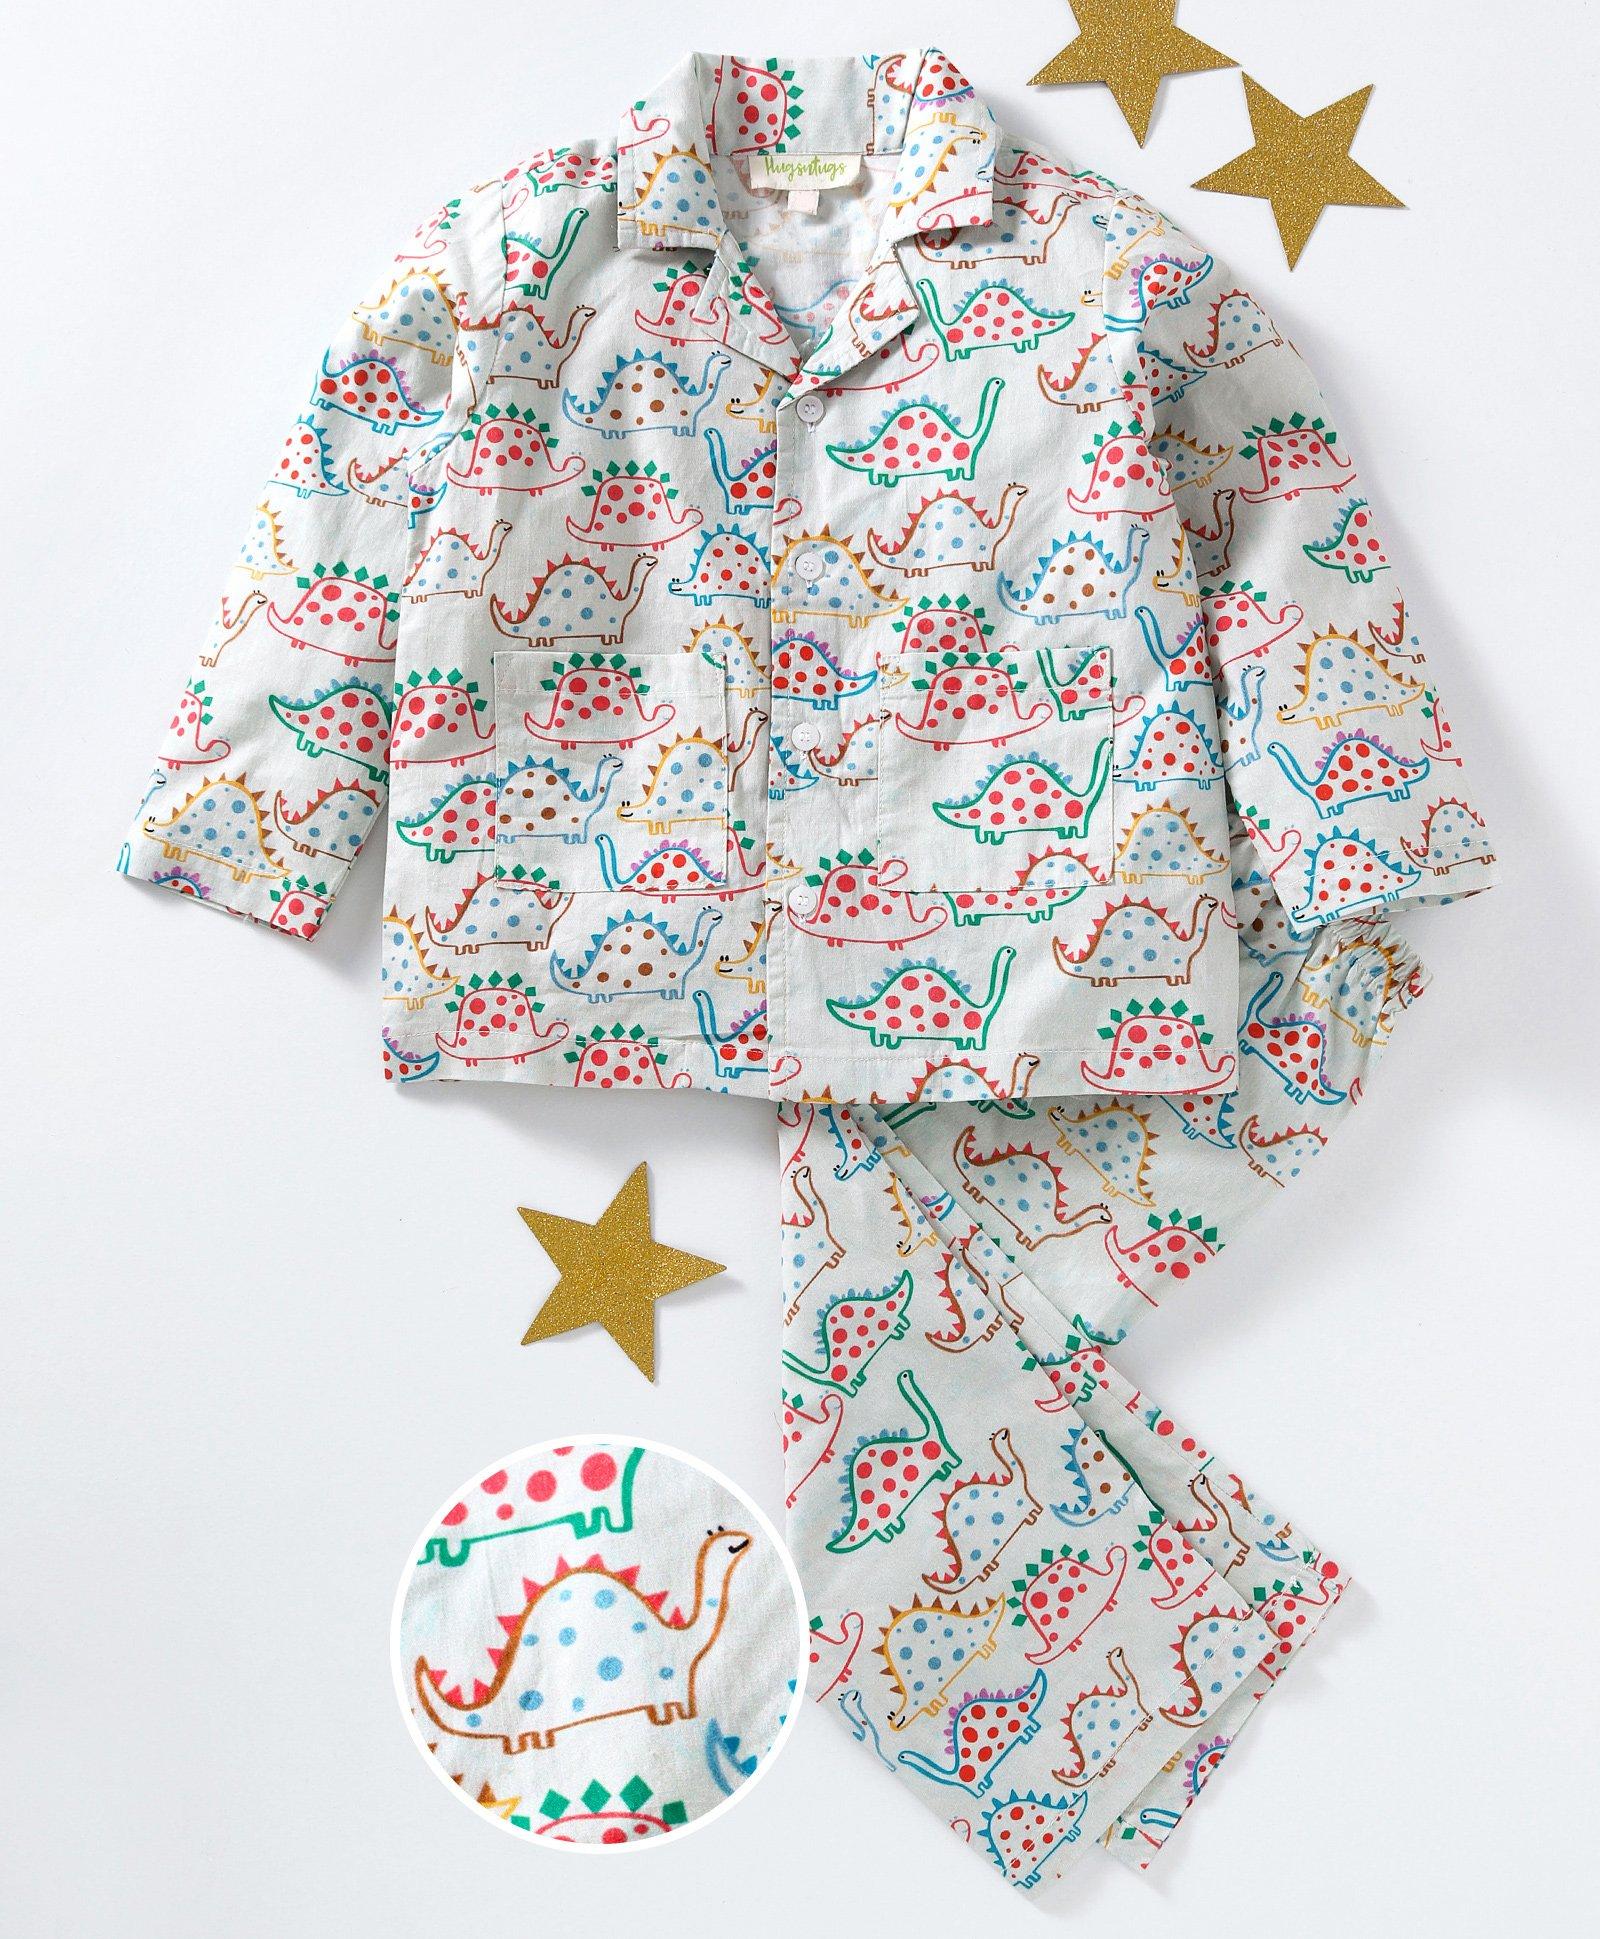 ba0ba95d3 Hugsntugs Dinosaur Print Full Sleeves Shirt & Bottom Night Suit - Multi  Color